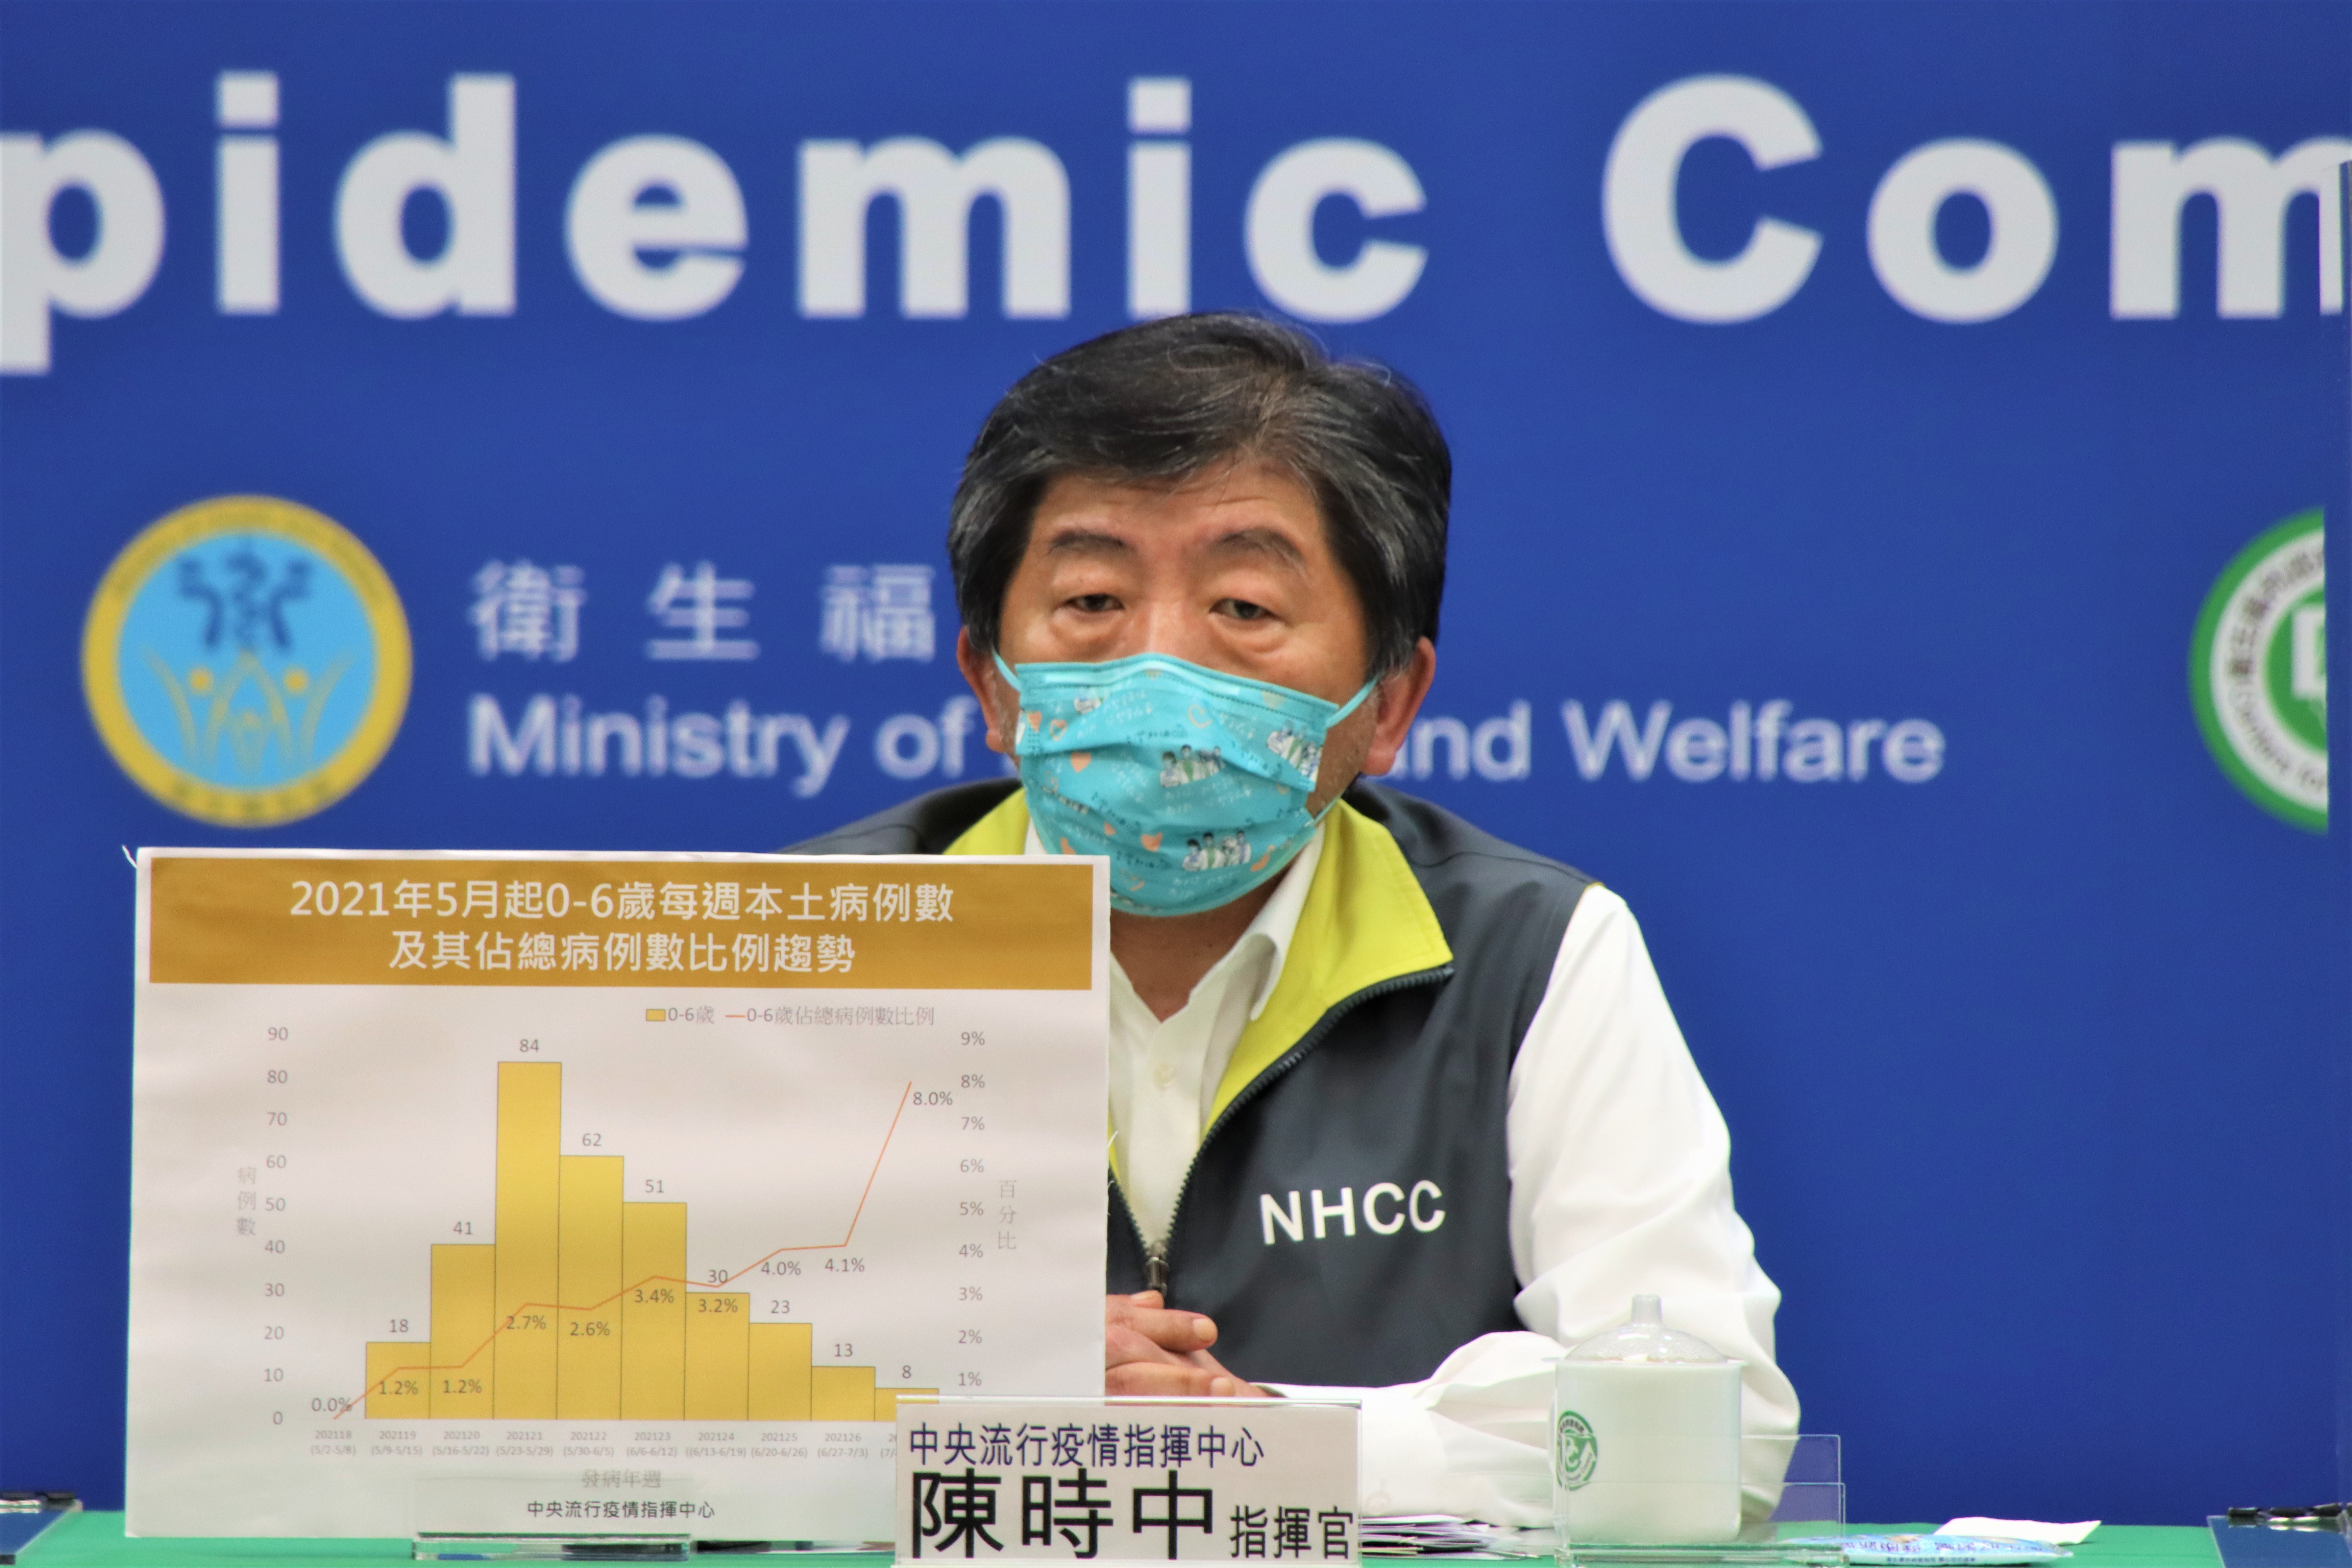 COVID-19,疫情,疫苗,上海復星,國台辦,郭台銘,鴻海,台積電,劉德音,永齡